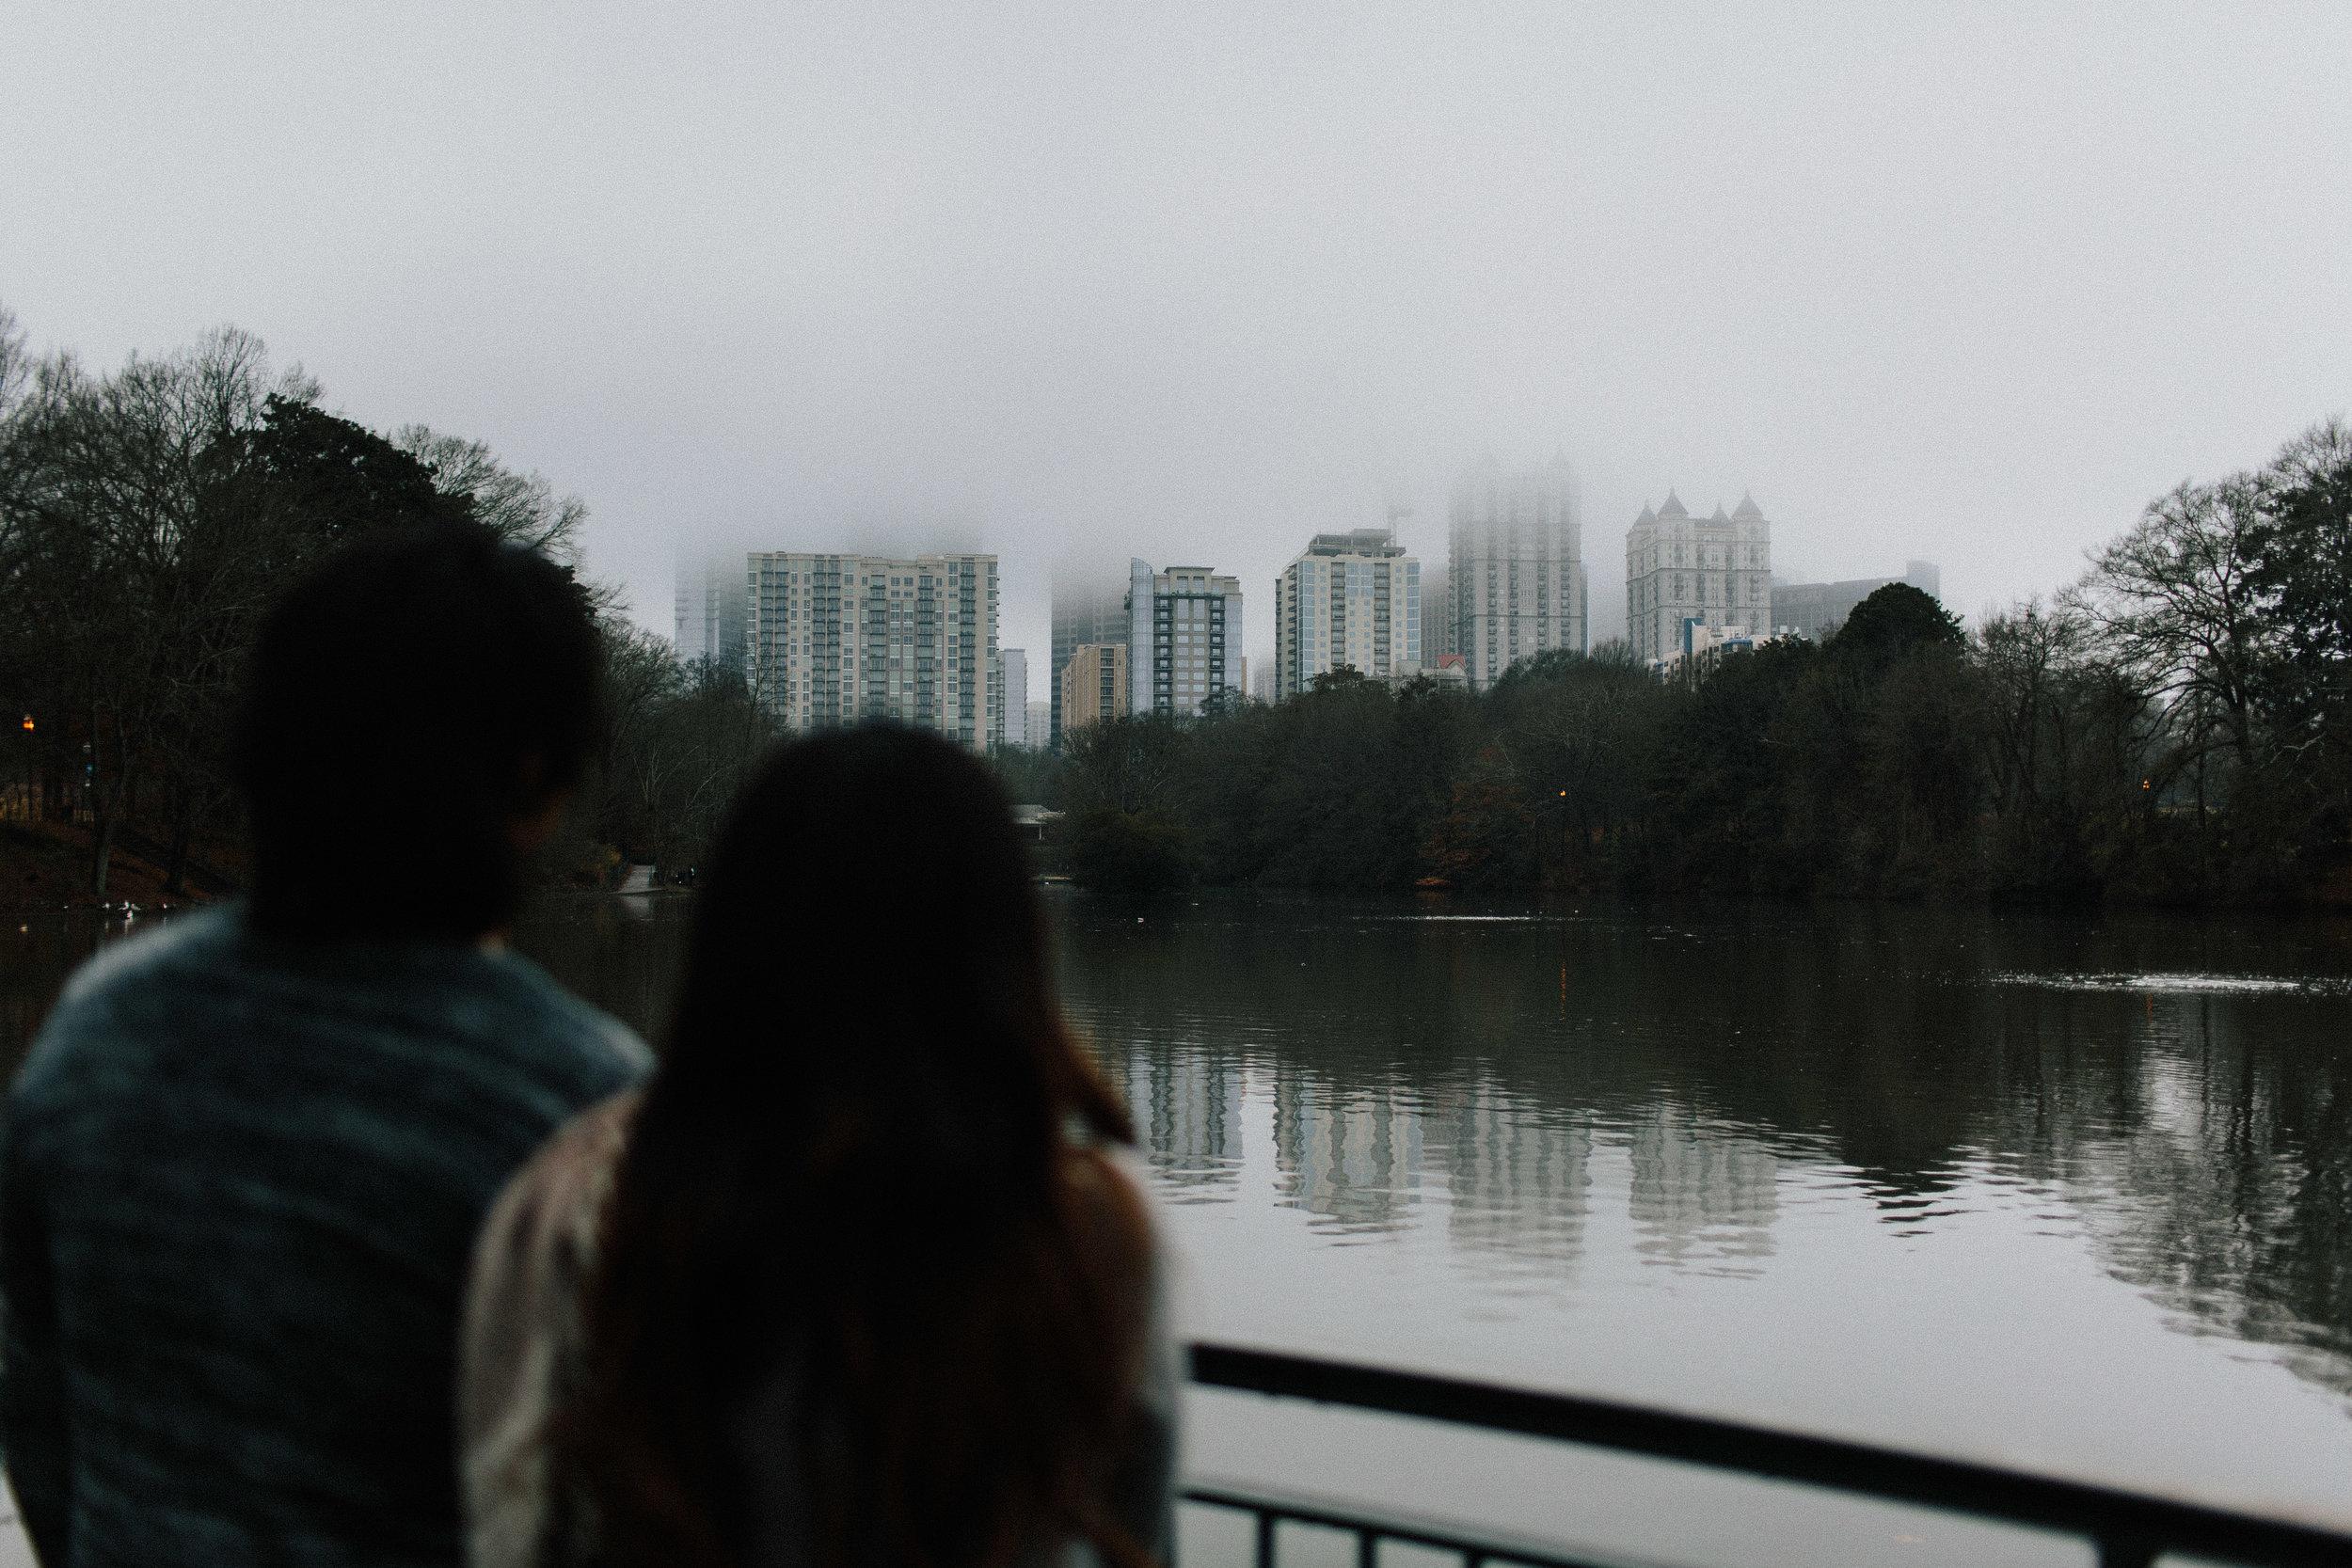 atlanta_gloomy_day_rainy_engagement_couple_lifestyle_fun_playful_artistic_georgia_photographer_2064.jpg